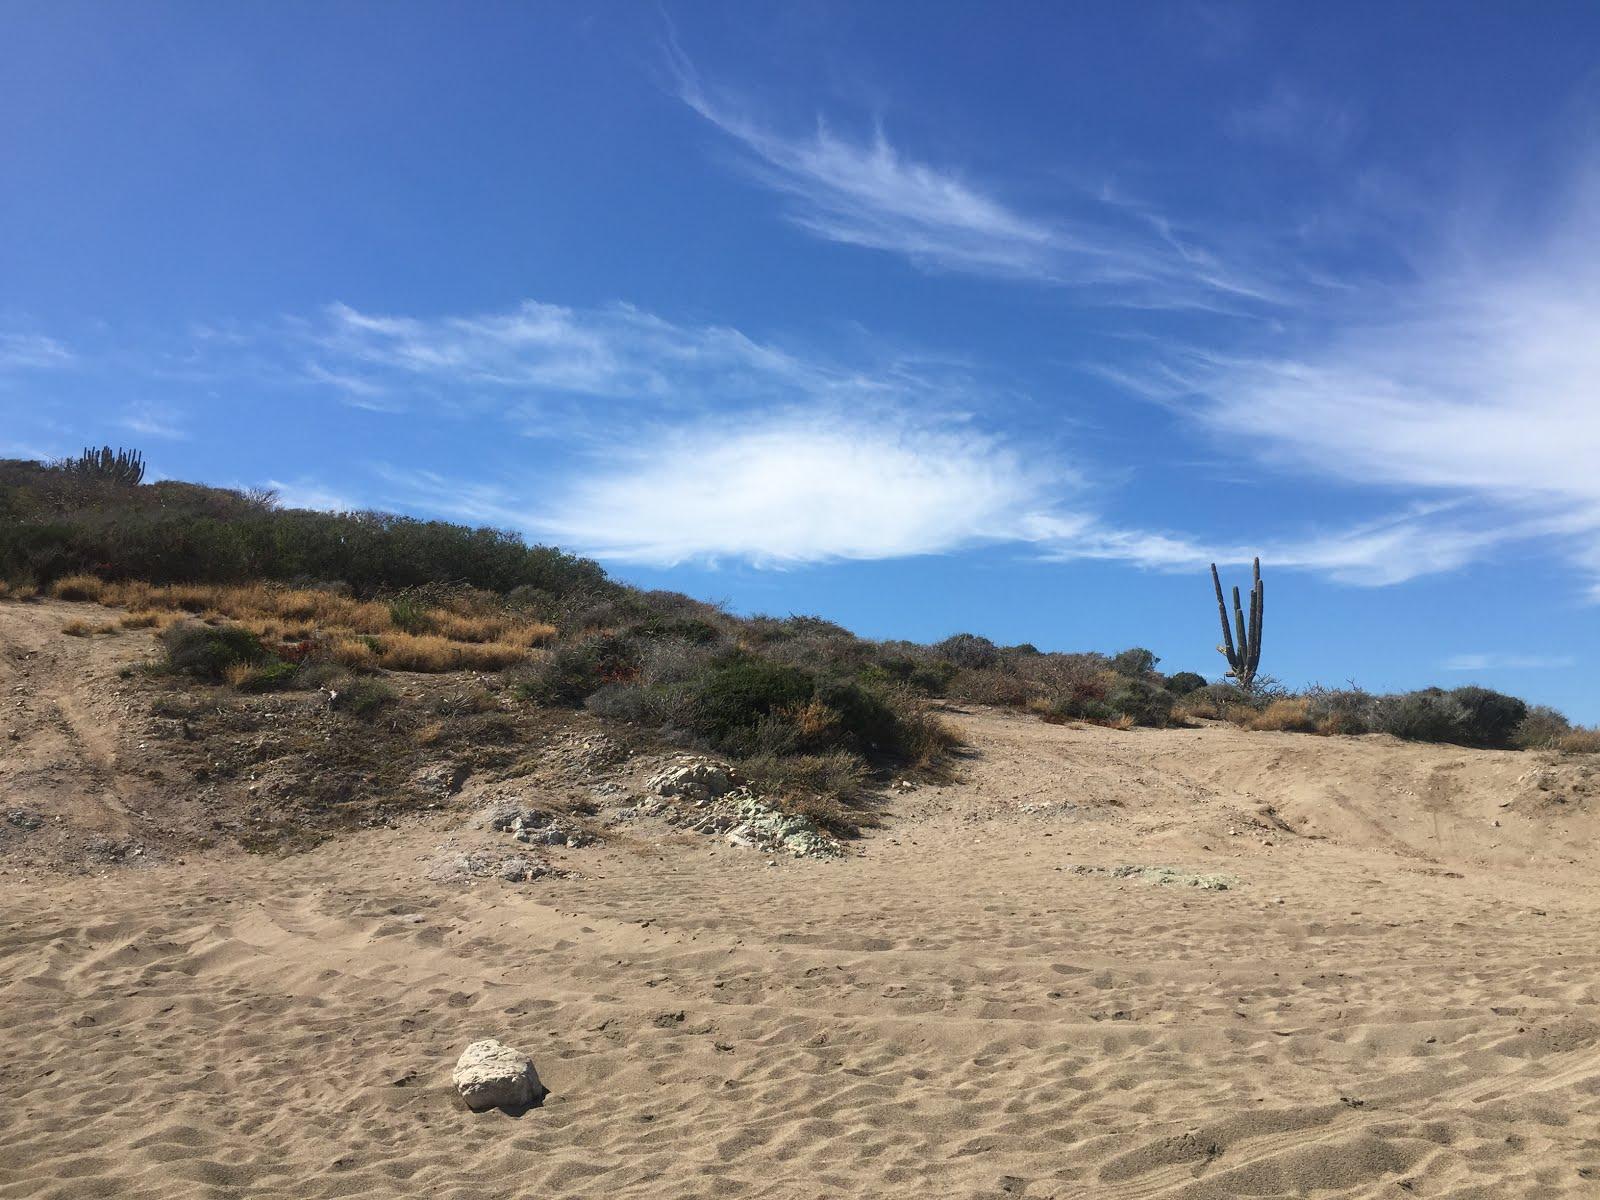 la playa piedras pintas au nord ouest du mexique